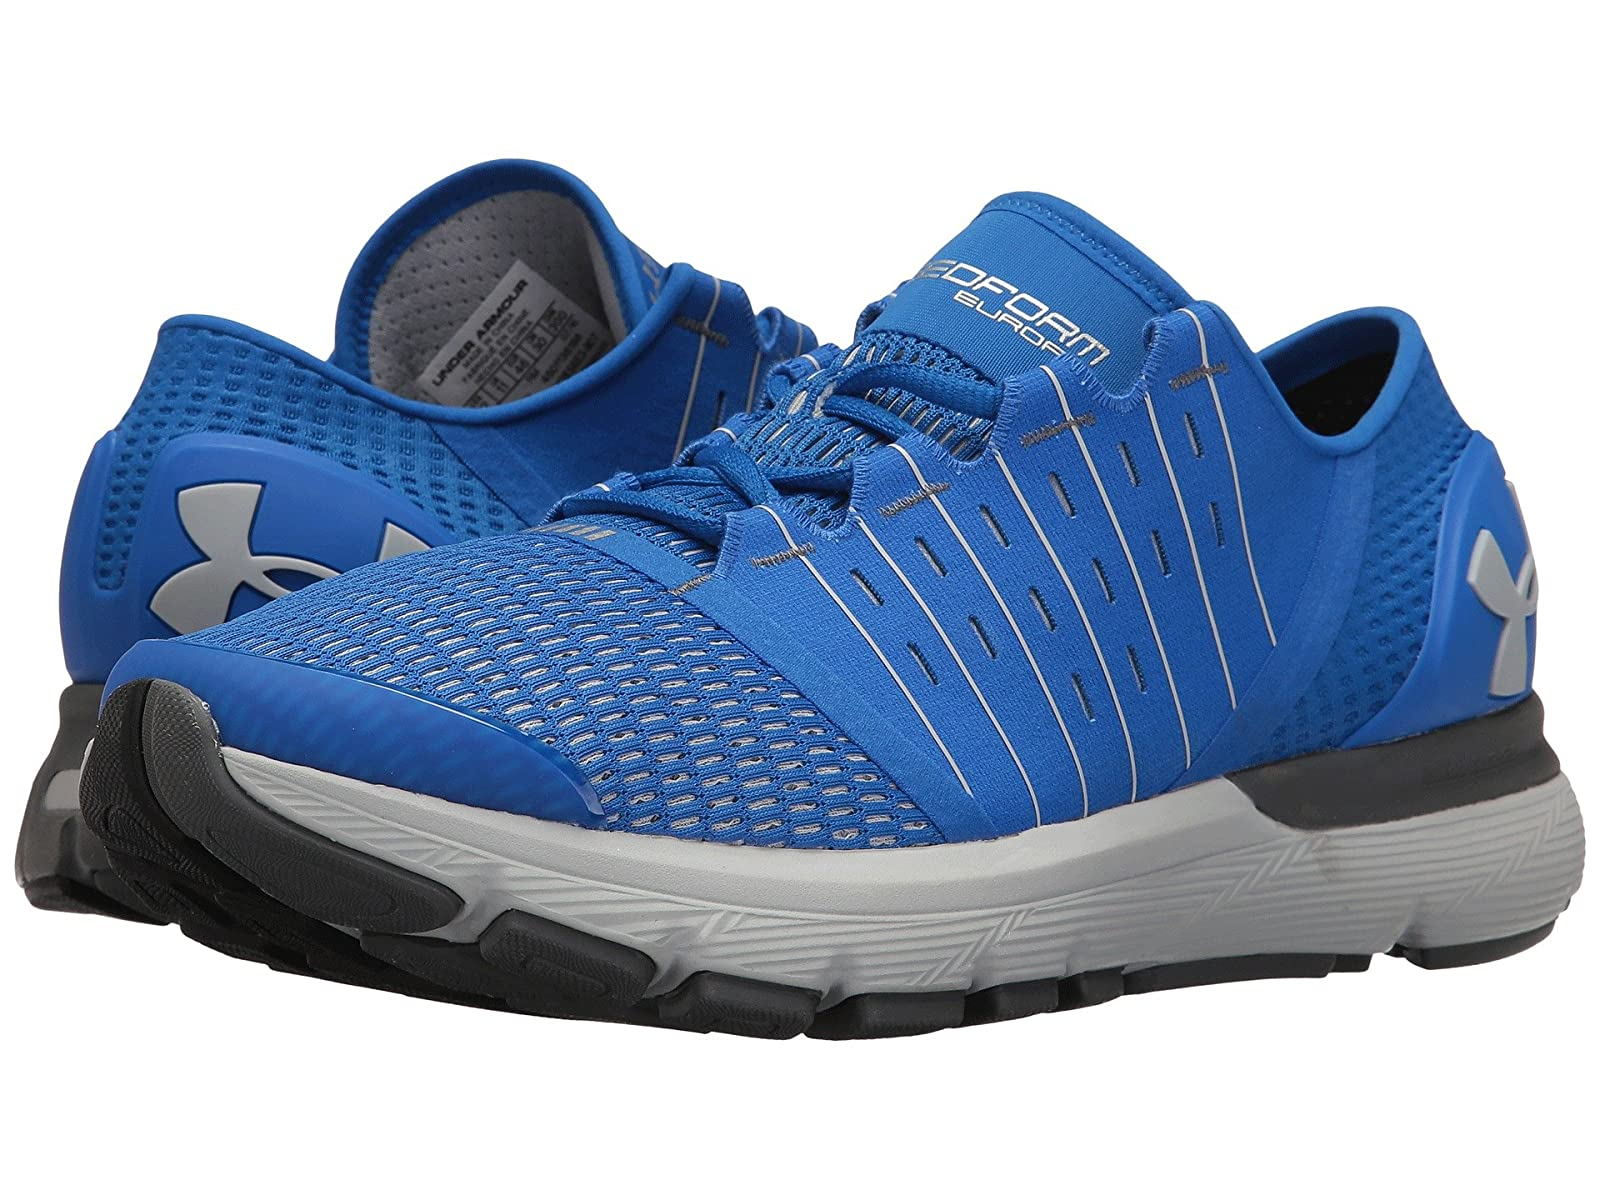 Under Armour UA Speedform EuropaCheap and distinctive eye-catching shoes